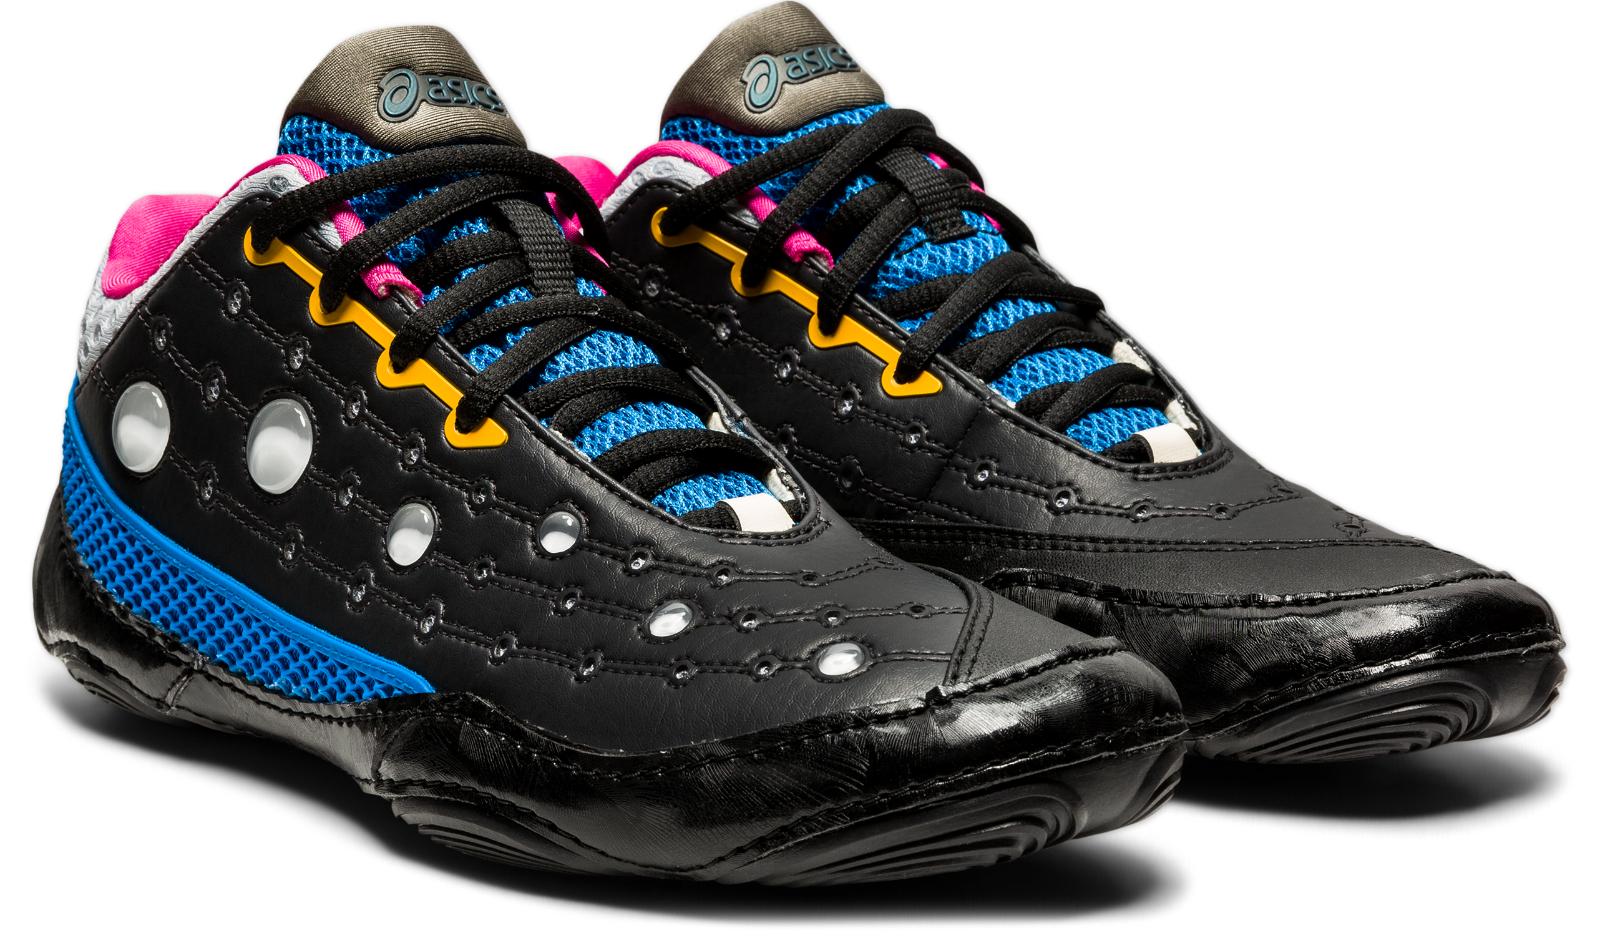 ASICS X KIKO KOSTADINOV 发布第二代女性专属鞋履 GESSIRIT™